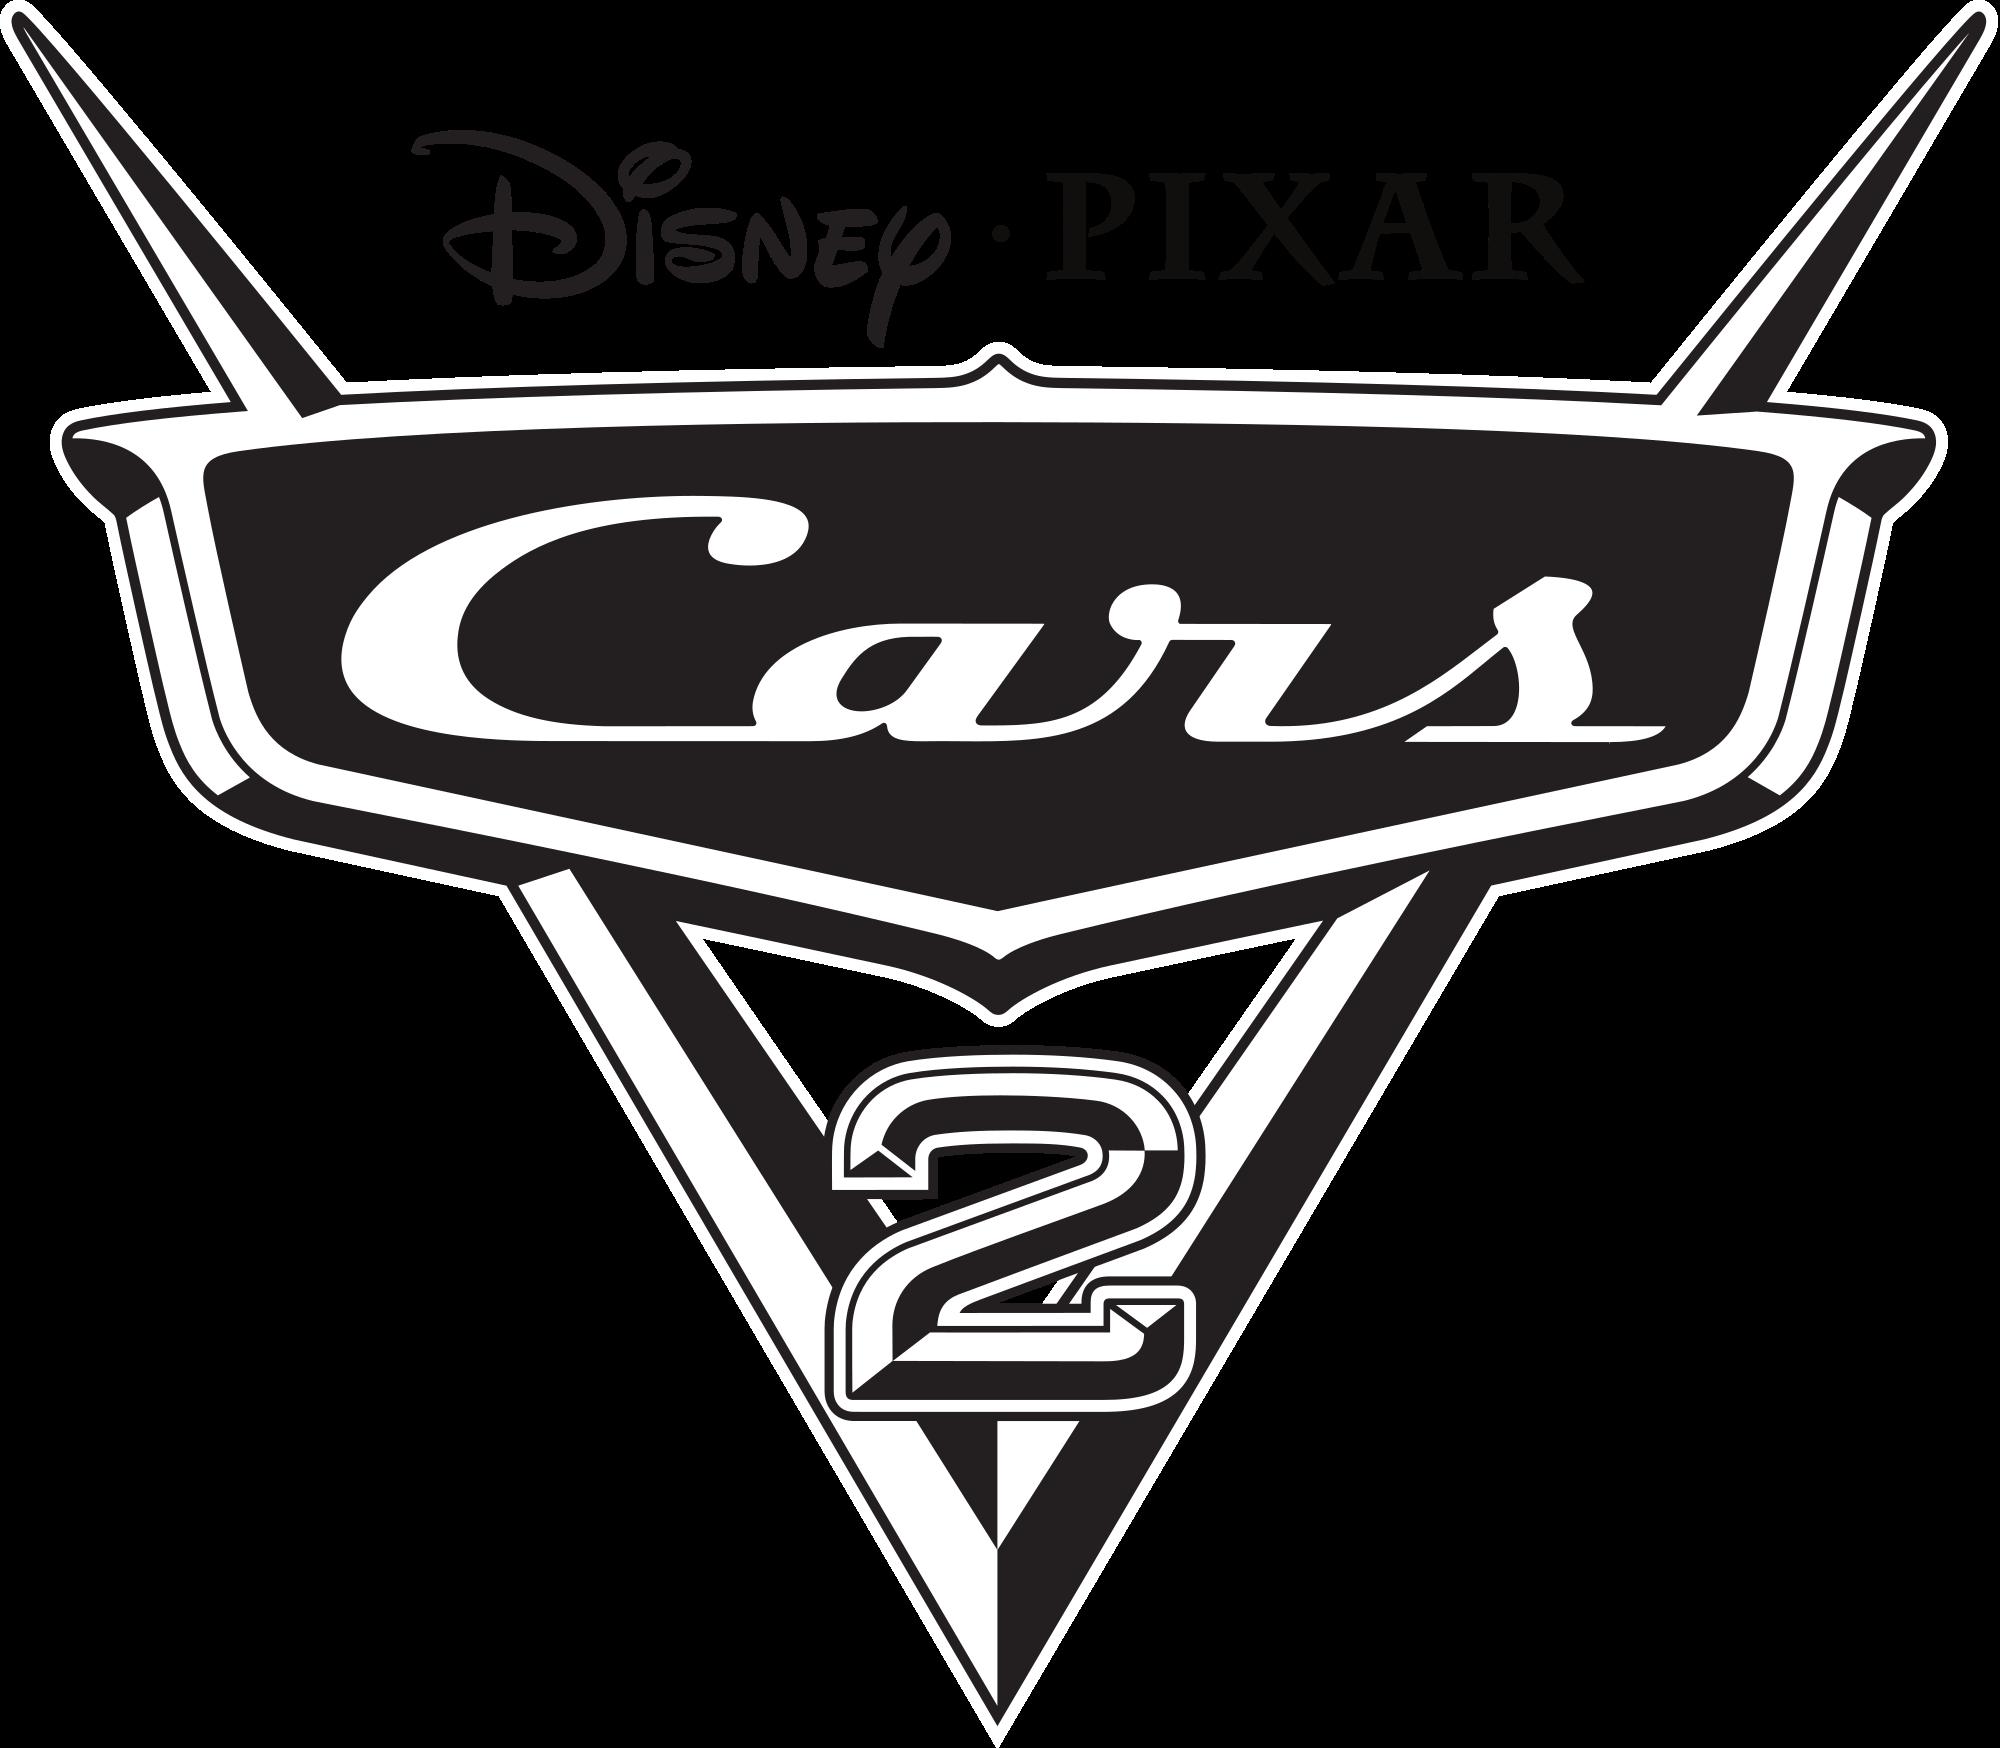 Cars 2 logo png 1 » PNG Image.